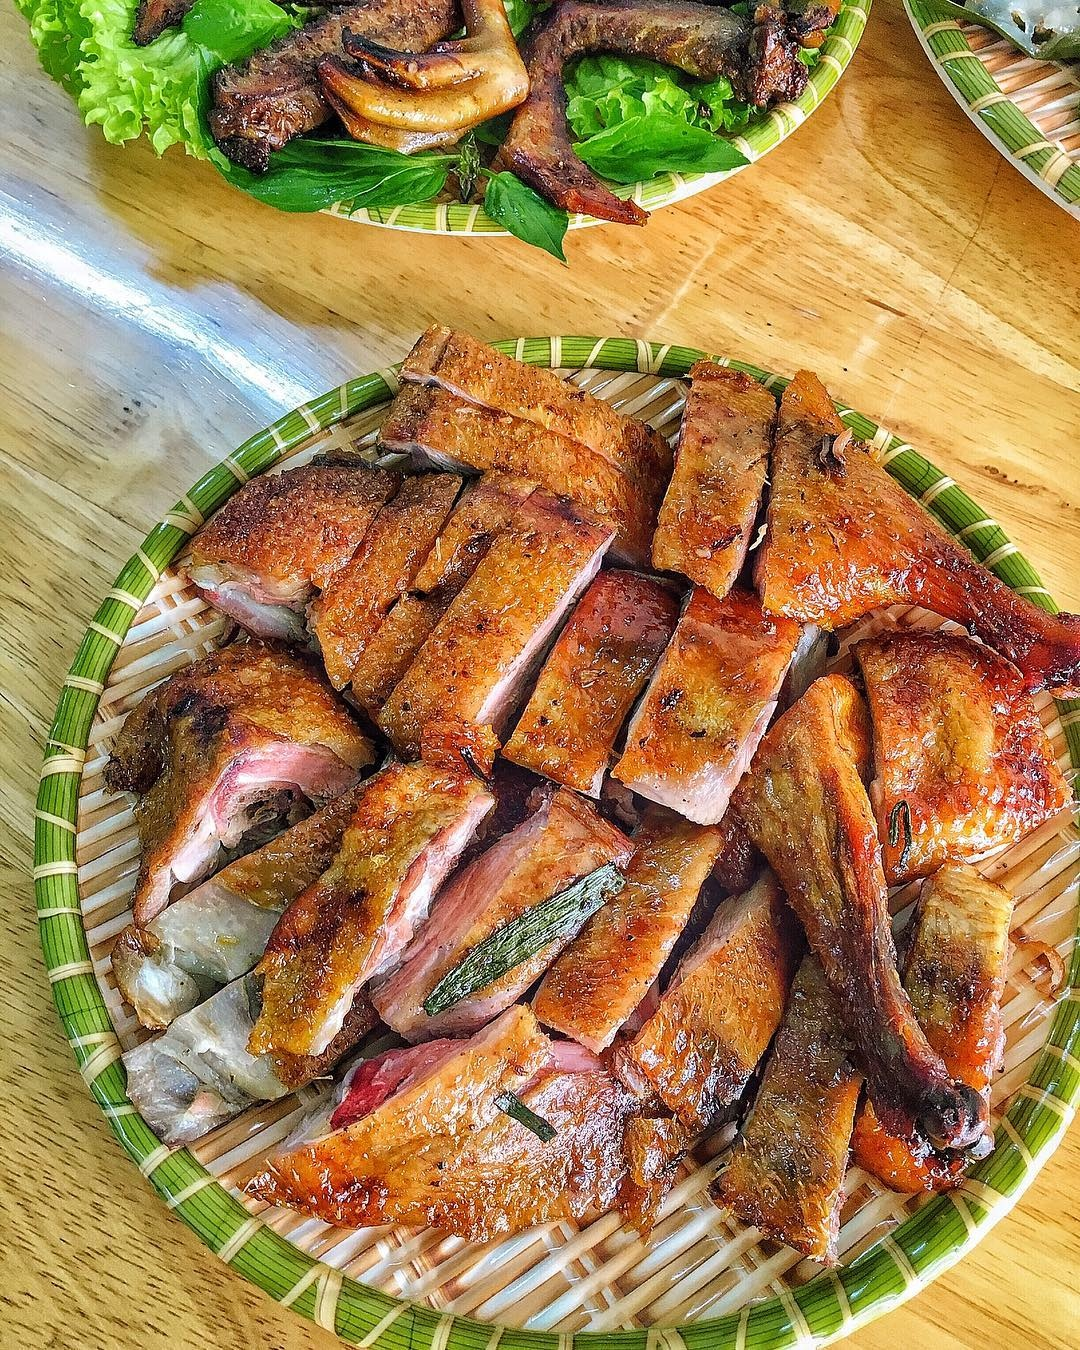 6 mon khoai khau nguoi Viet thuong tranh an trong 3 ngay Tet hinh anh 7